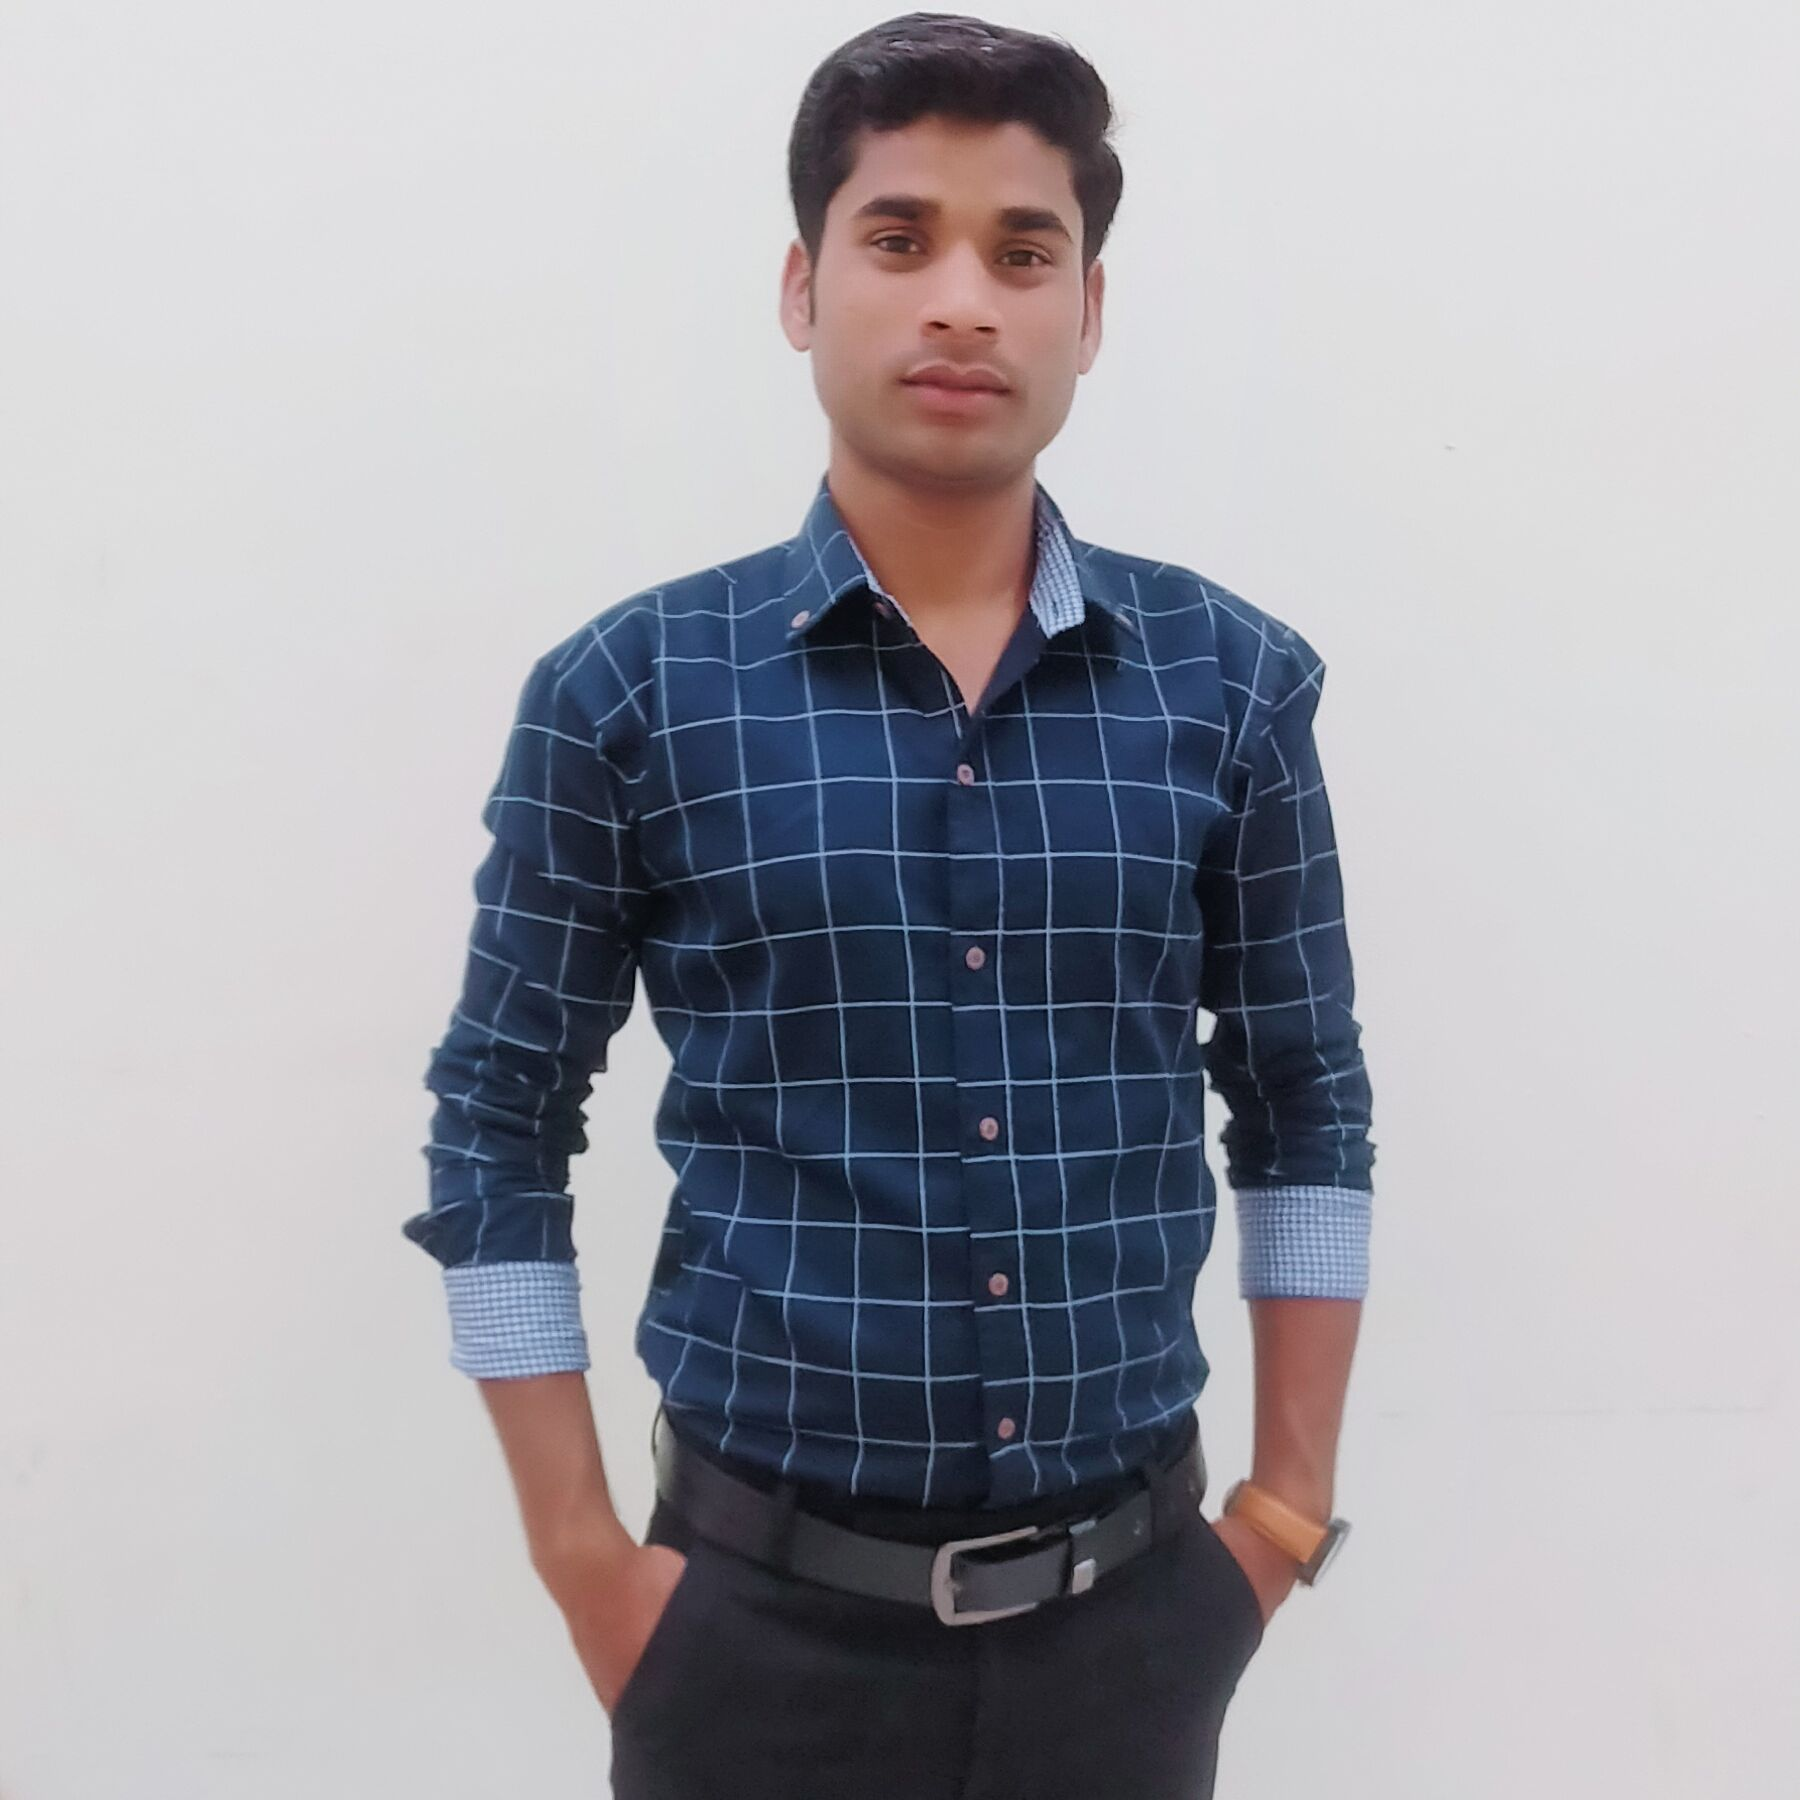 Thakur Prasad Rathour